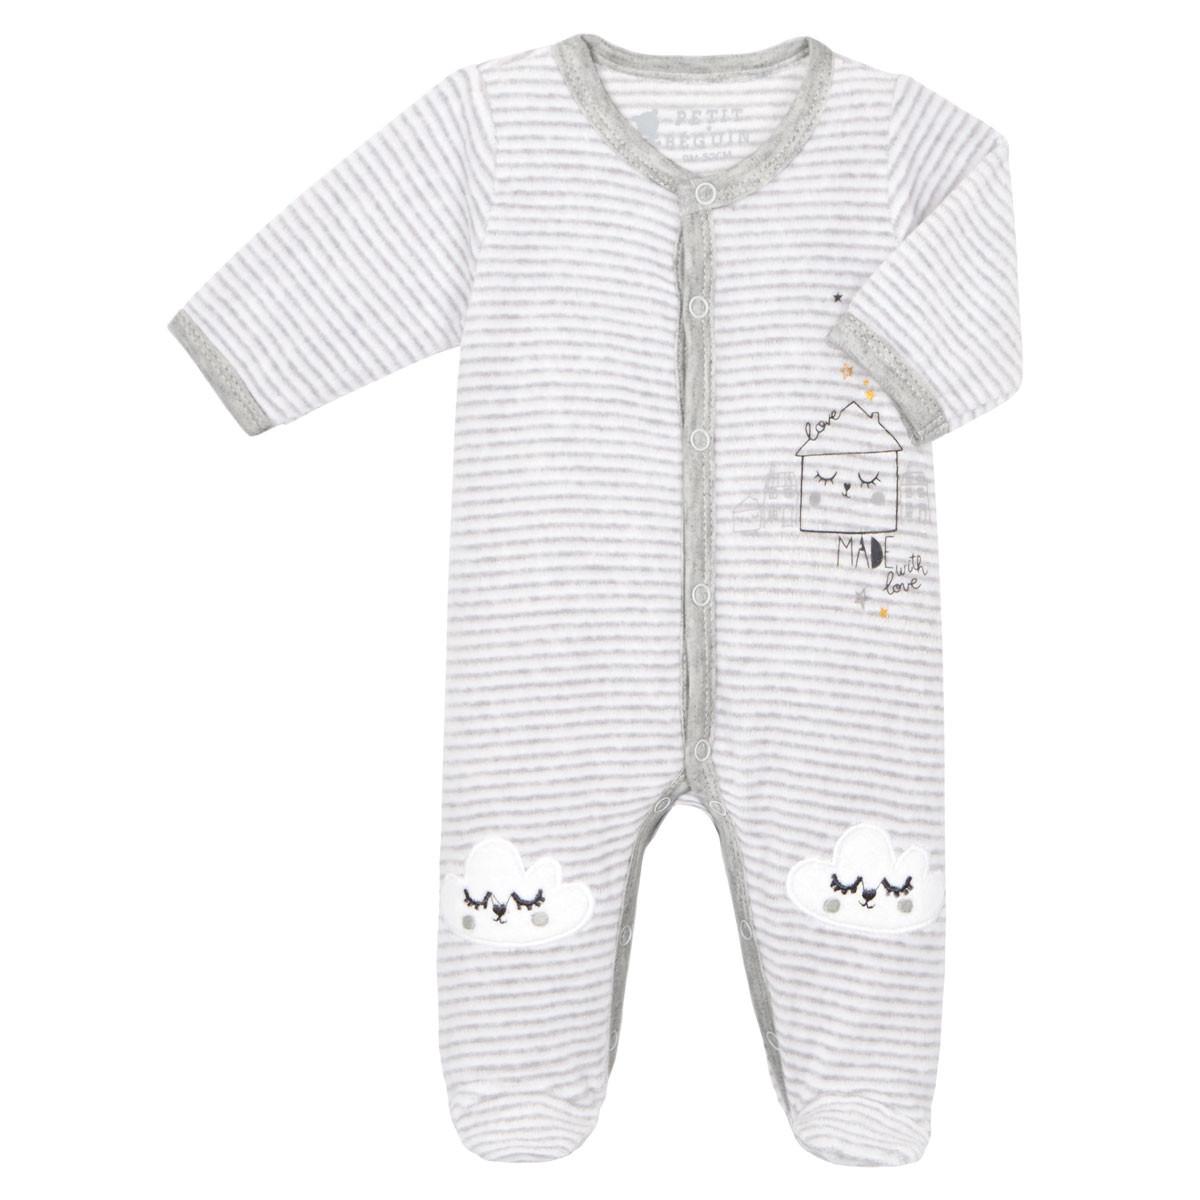 801277452ee60 Pyjama bébé velours mixte With Love - PETIT BEGUIN